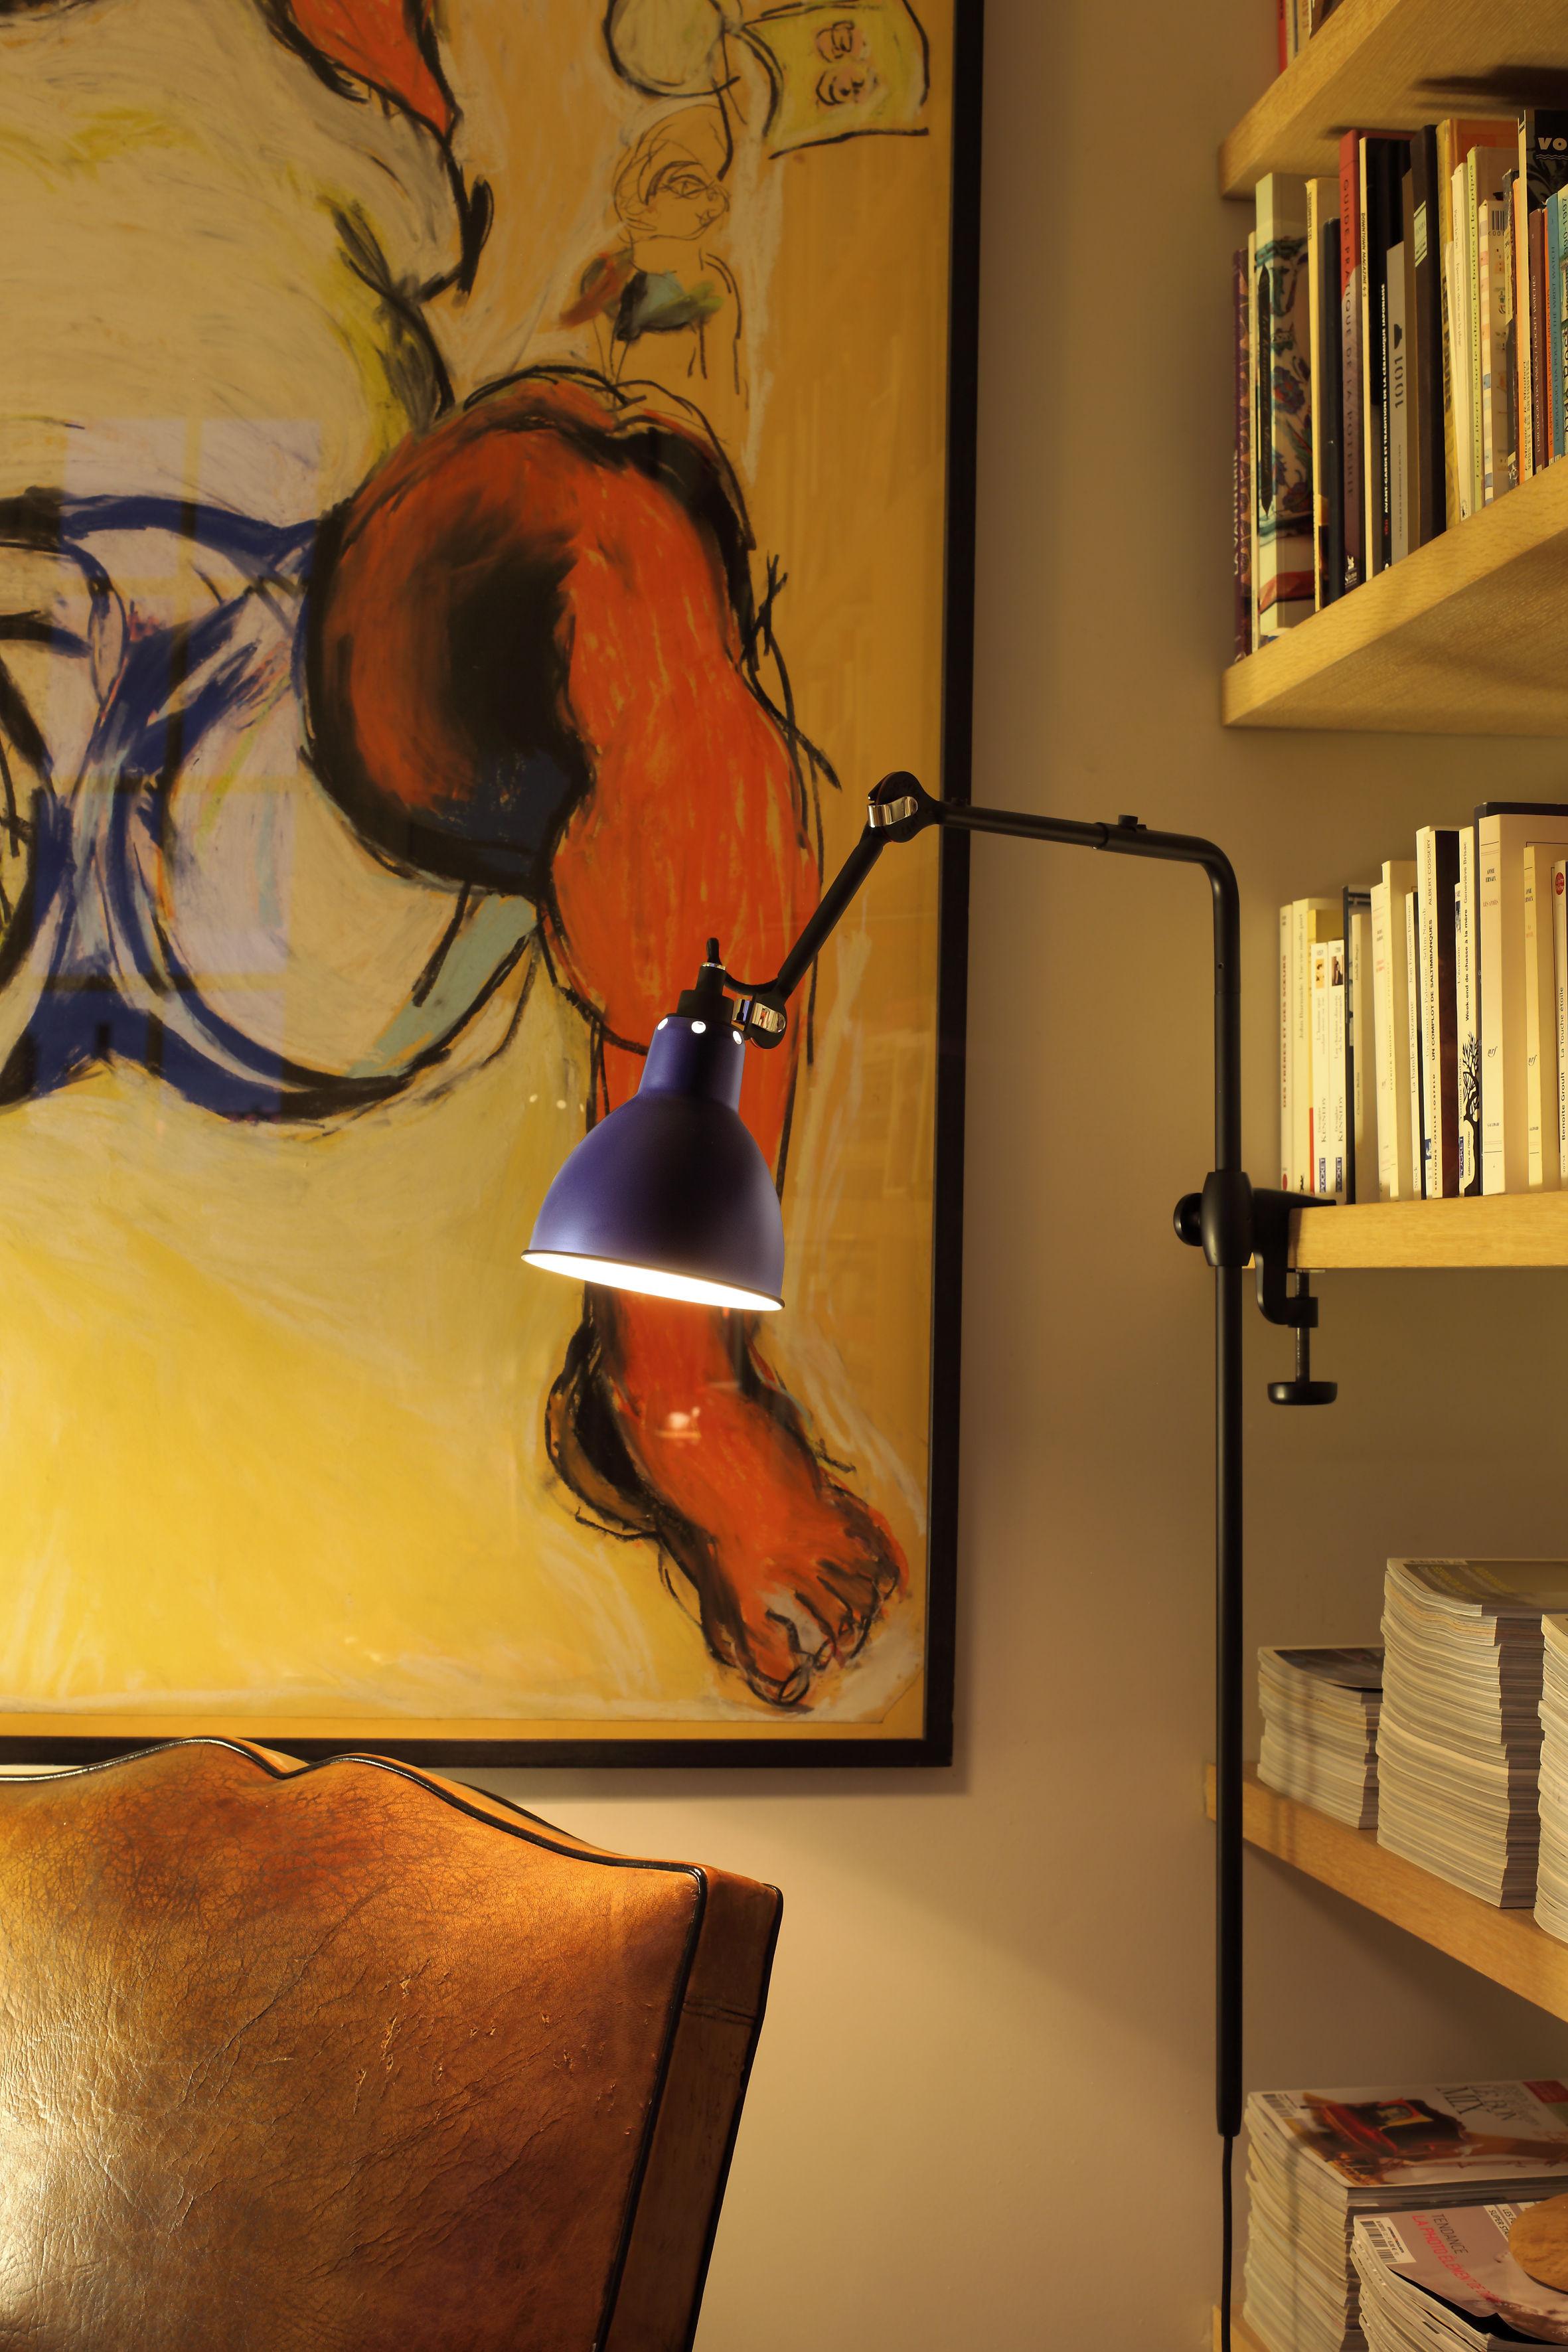 lampe n 226 pour biblioth que base tau lampe gras. Black Bedroom Furniture Sets. Home Design Ideas